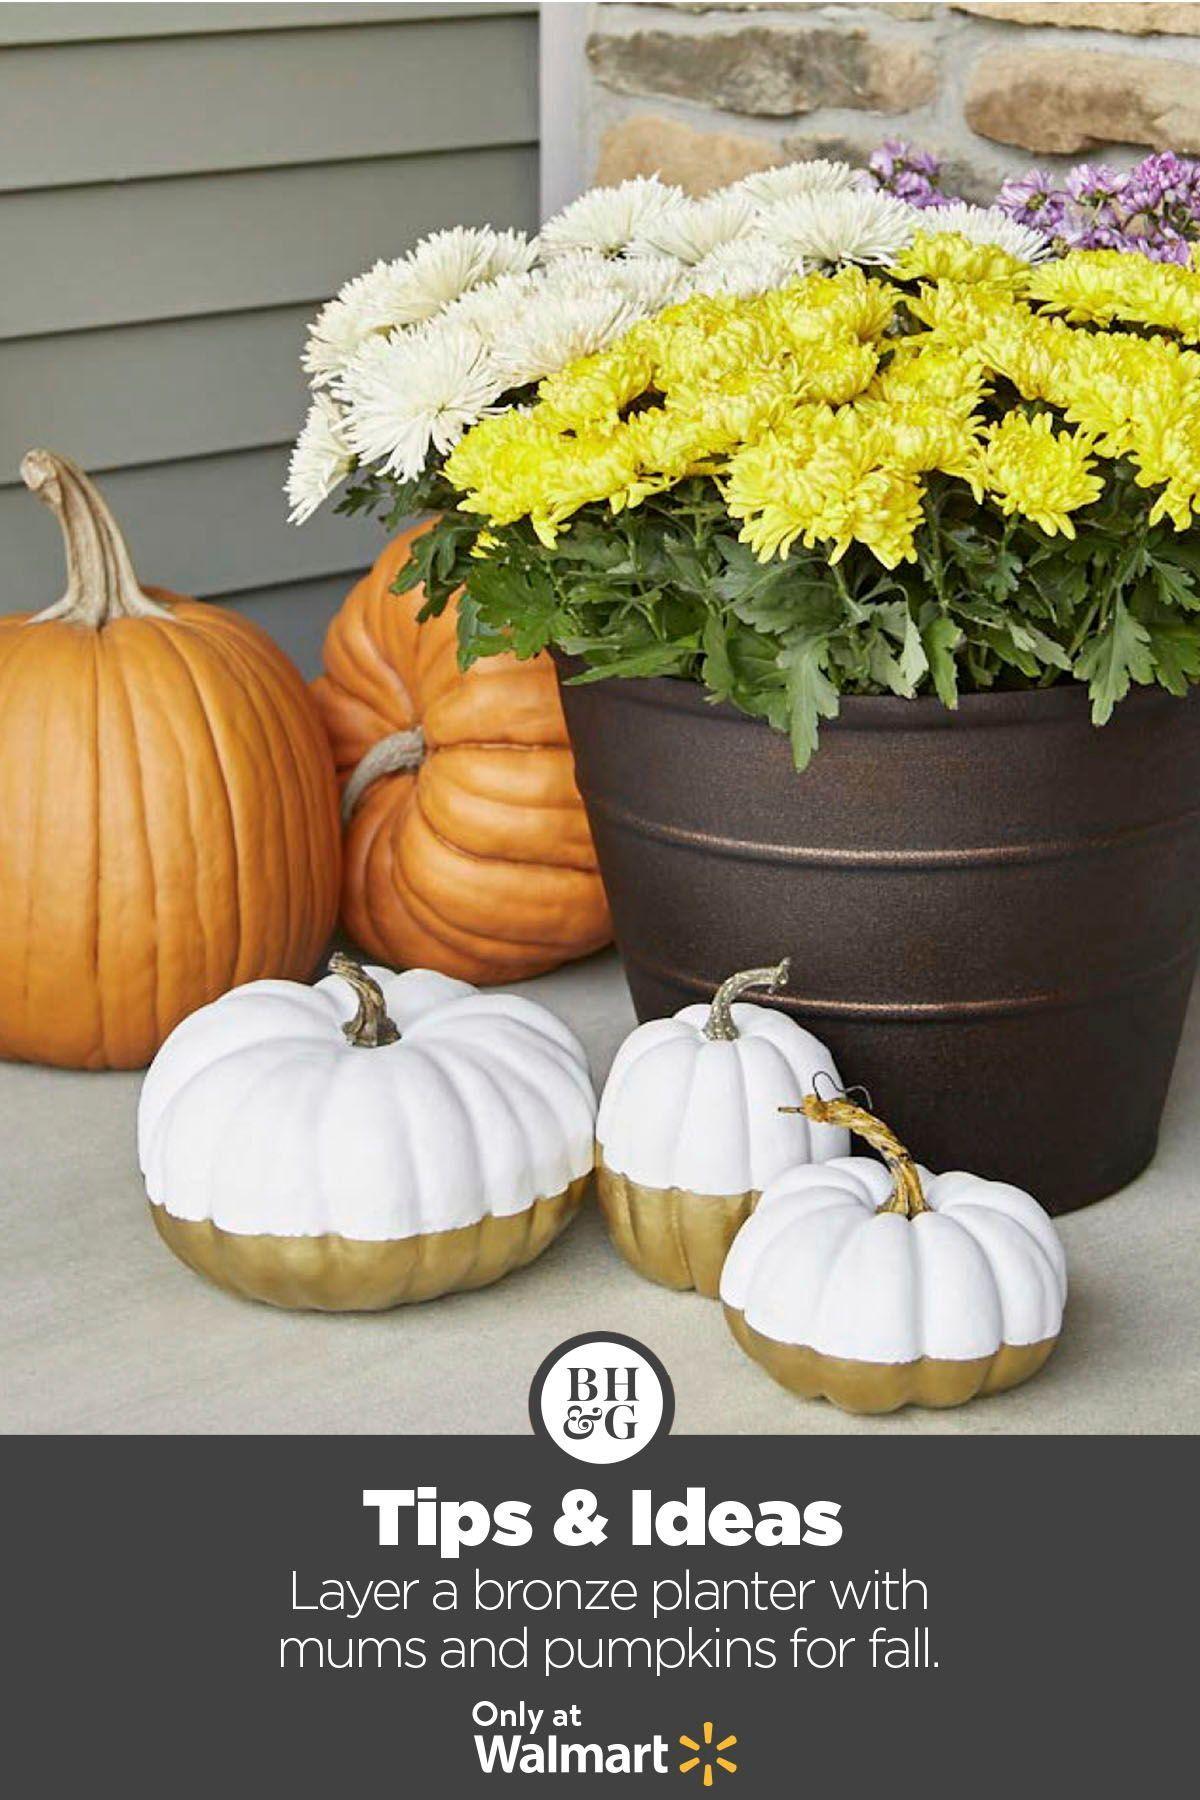 eeab2a5051b70559d9bcbc46d5f1ebe2 - Better Homes And Gardens Pumpkin Bowls